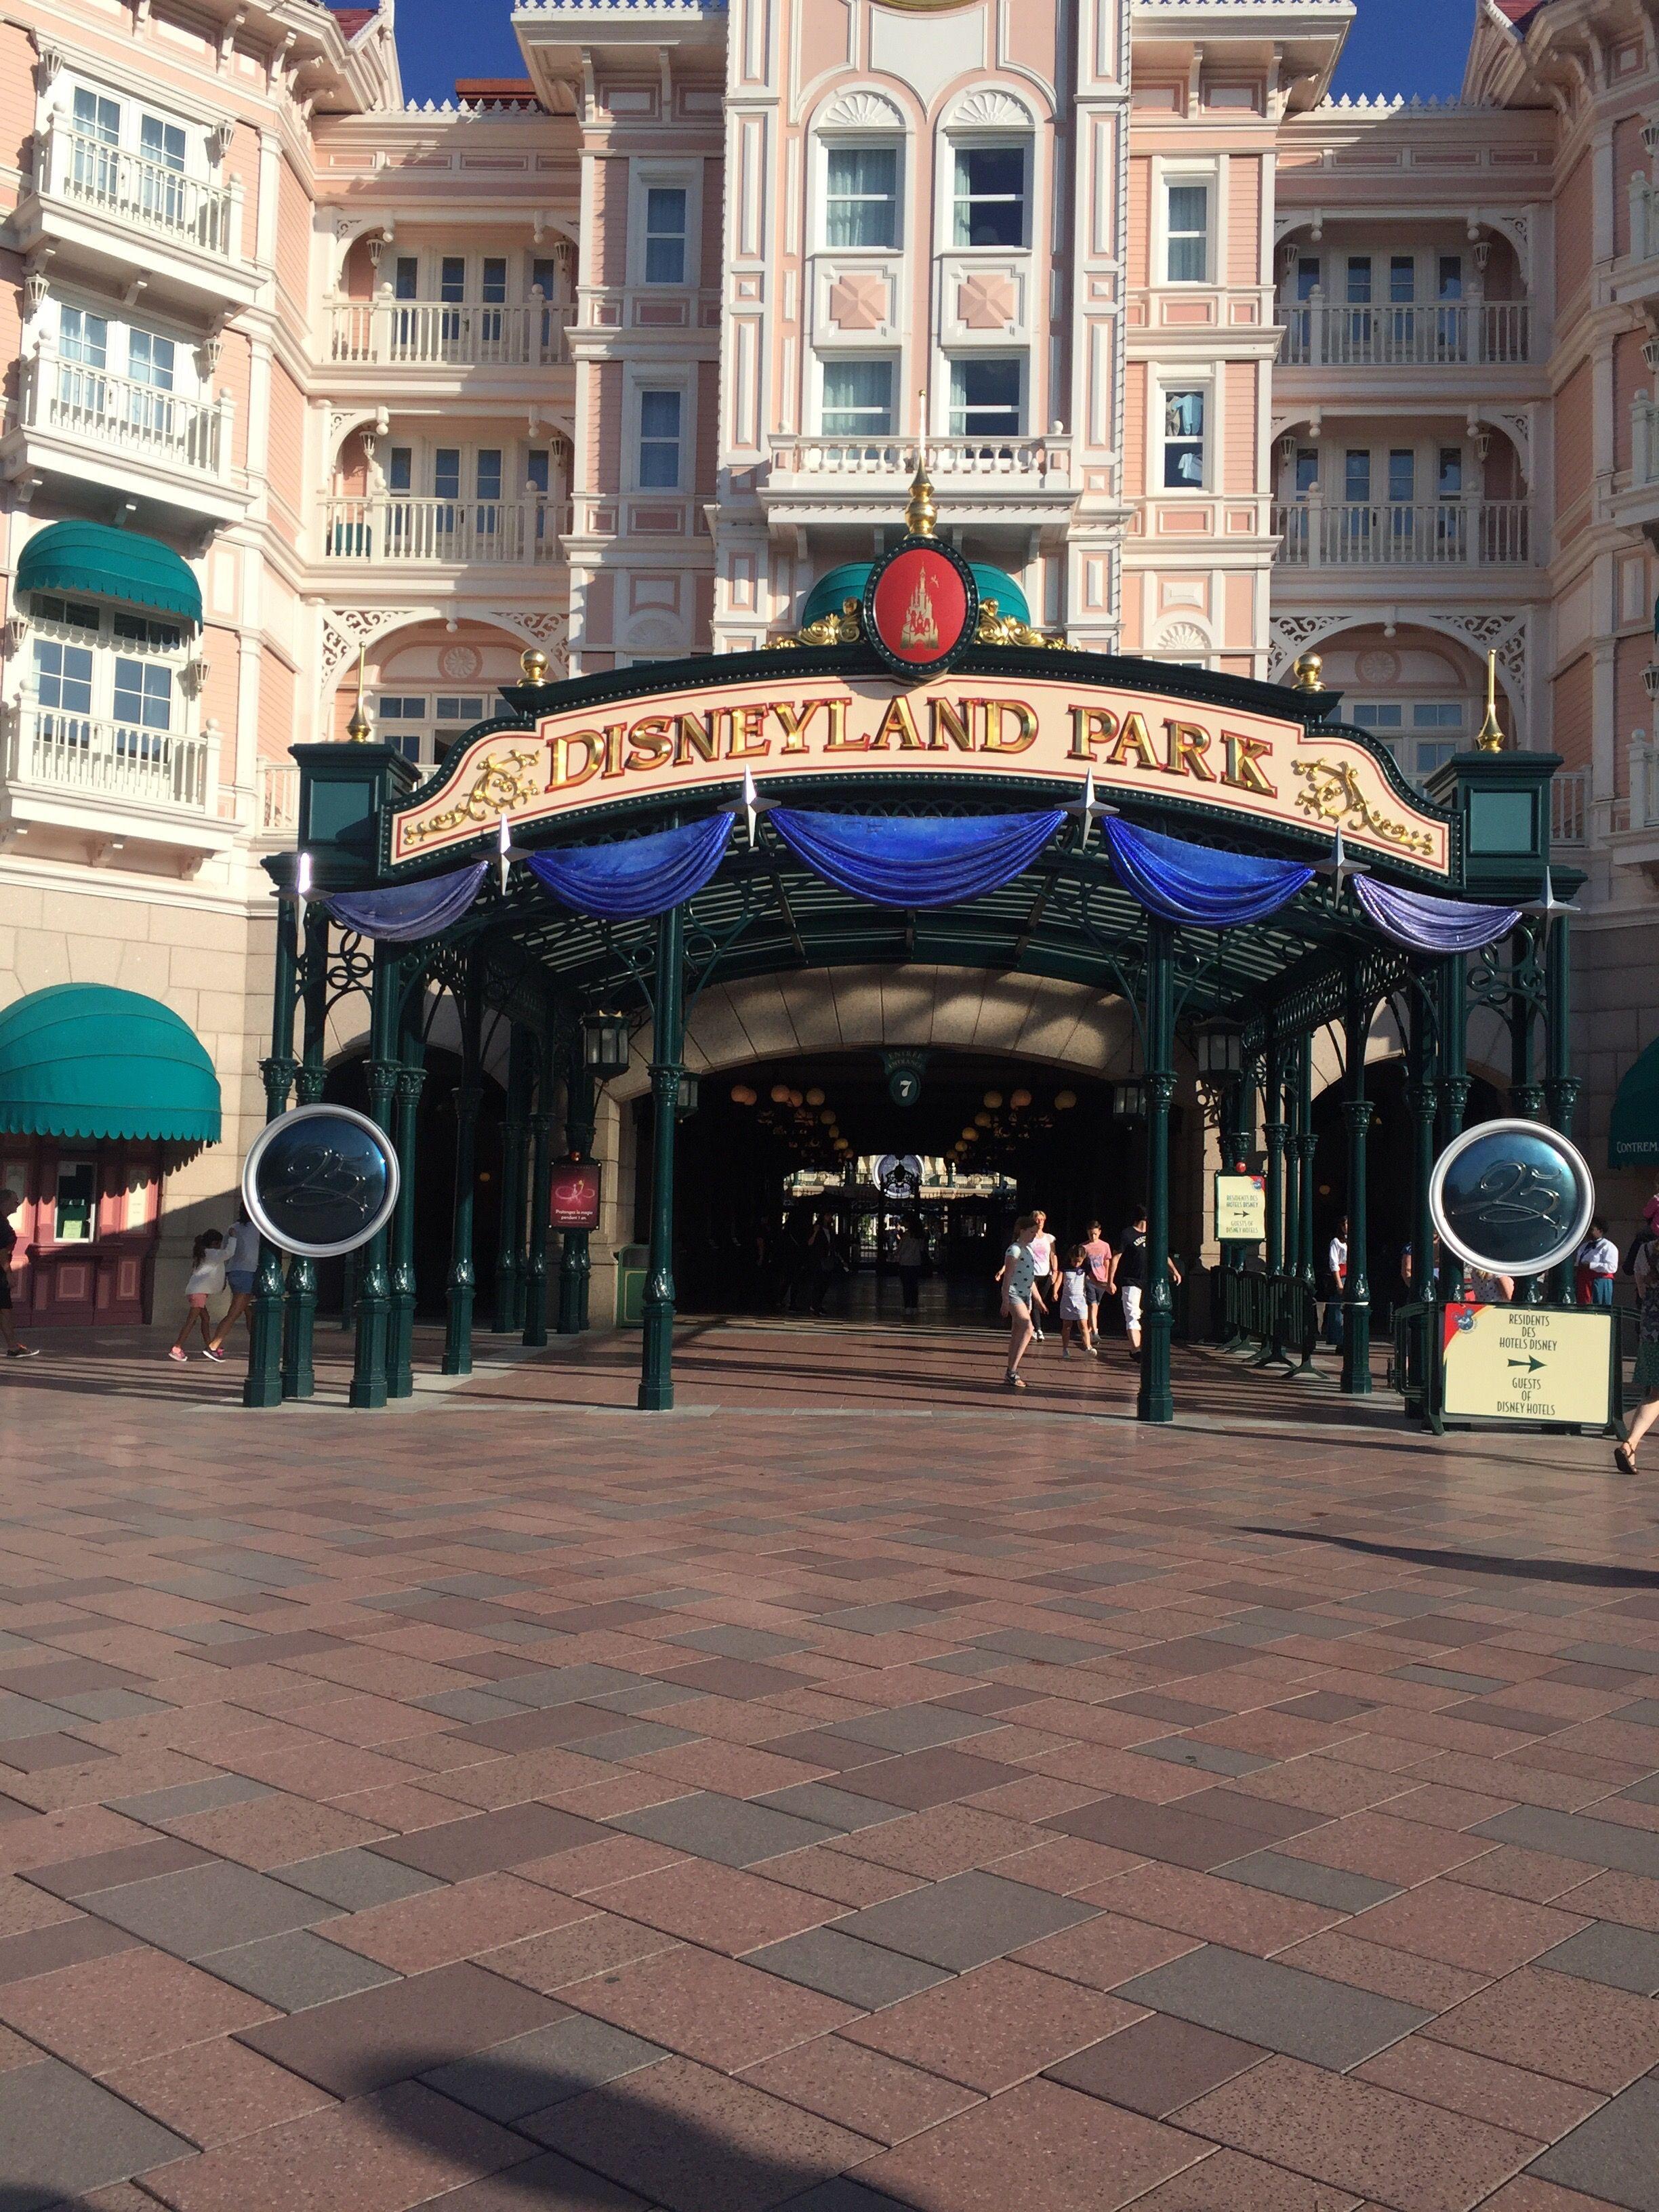 Visiting Disneyland Paris soon? Here's how long I